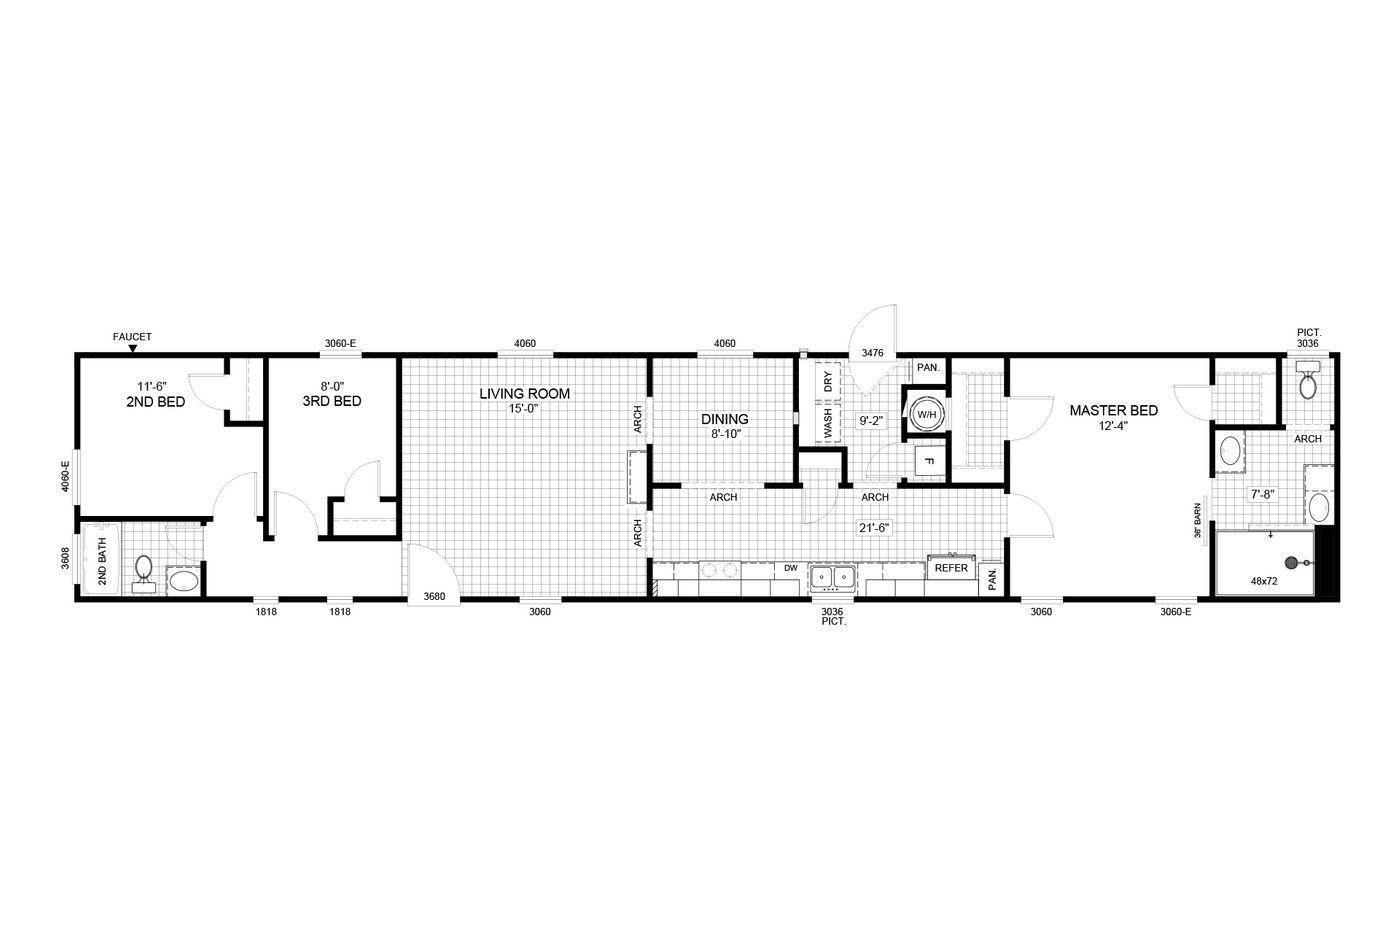 2463mar Floorplan